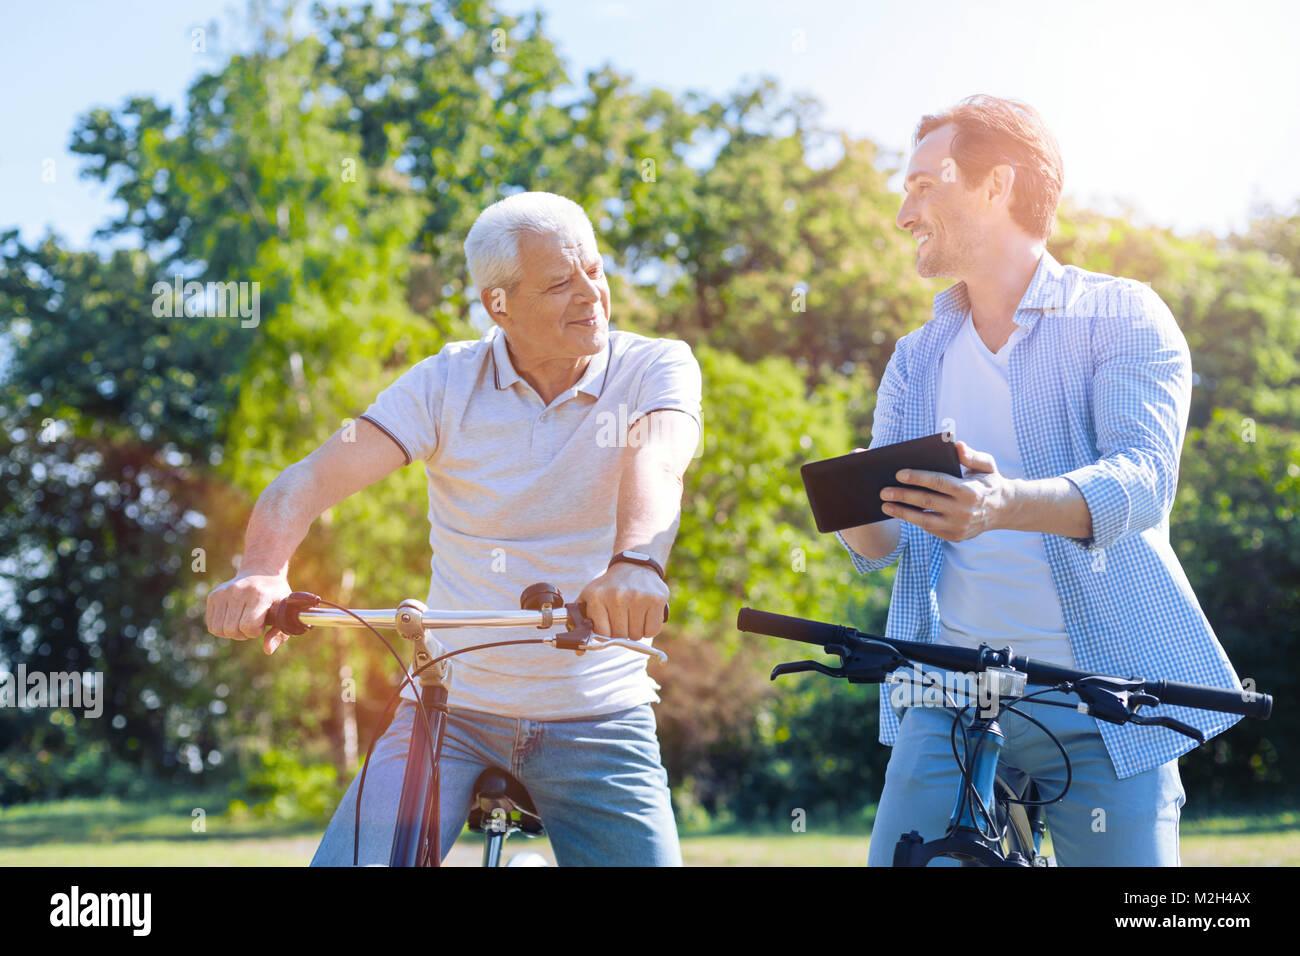 Padre e hijo con touchpad montando sus bicicletas. Imagen De Stock